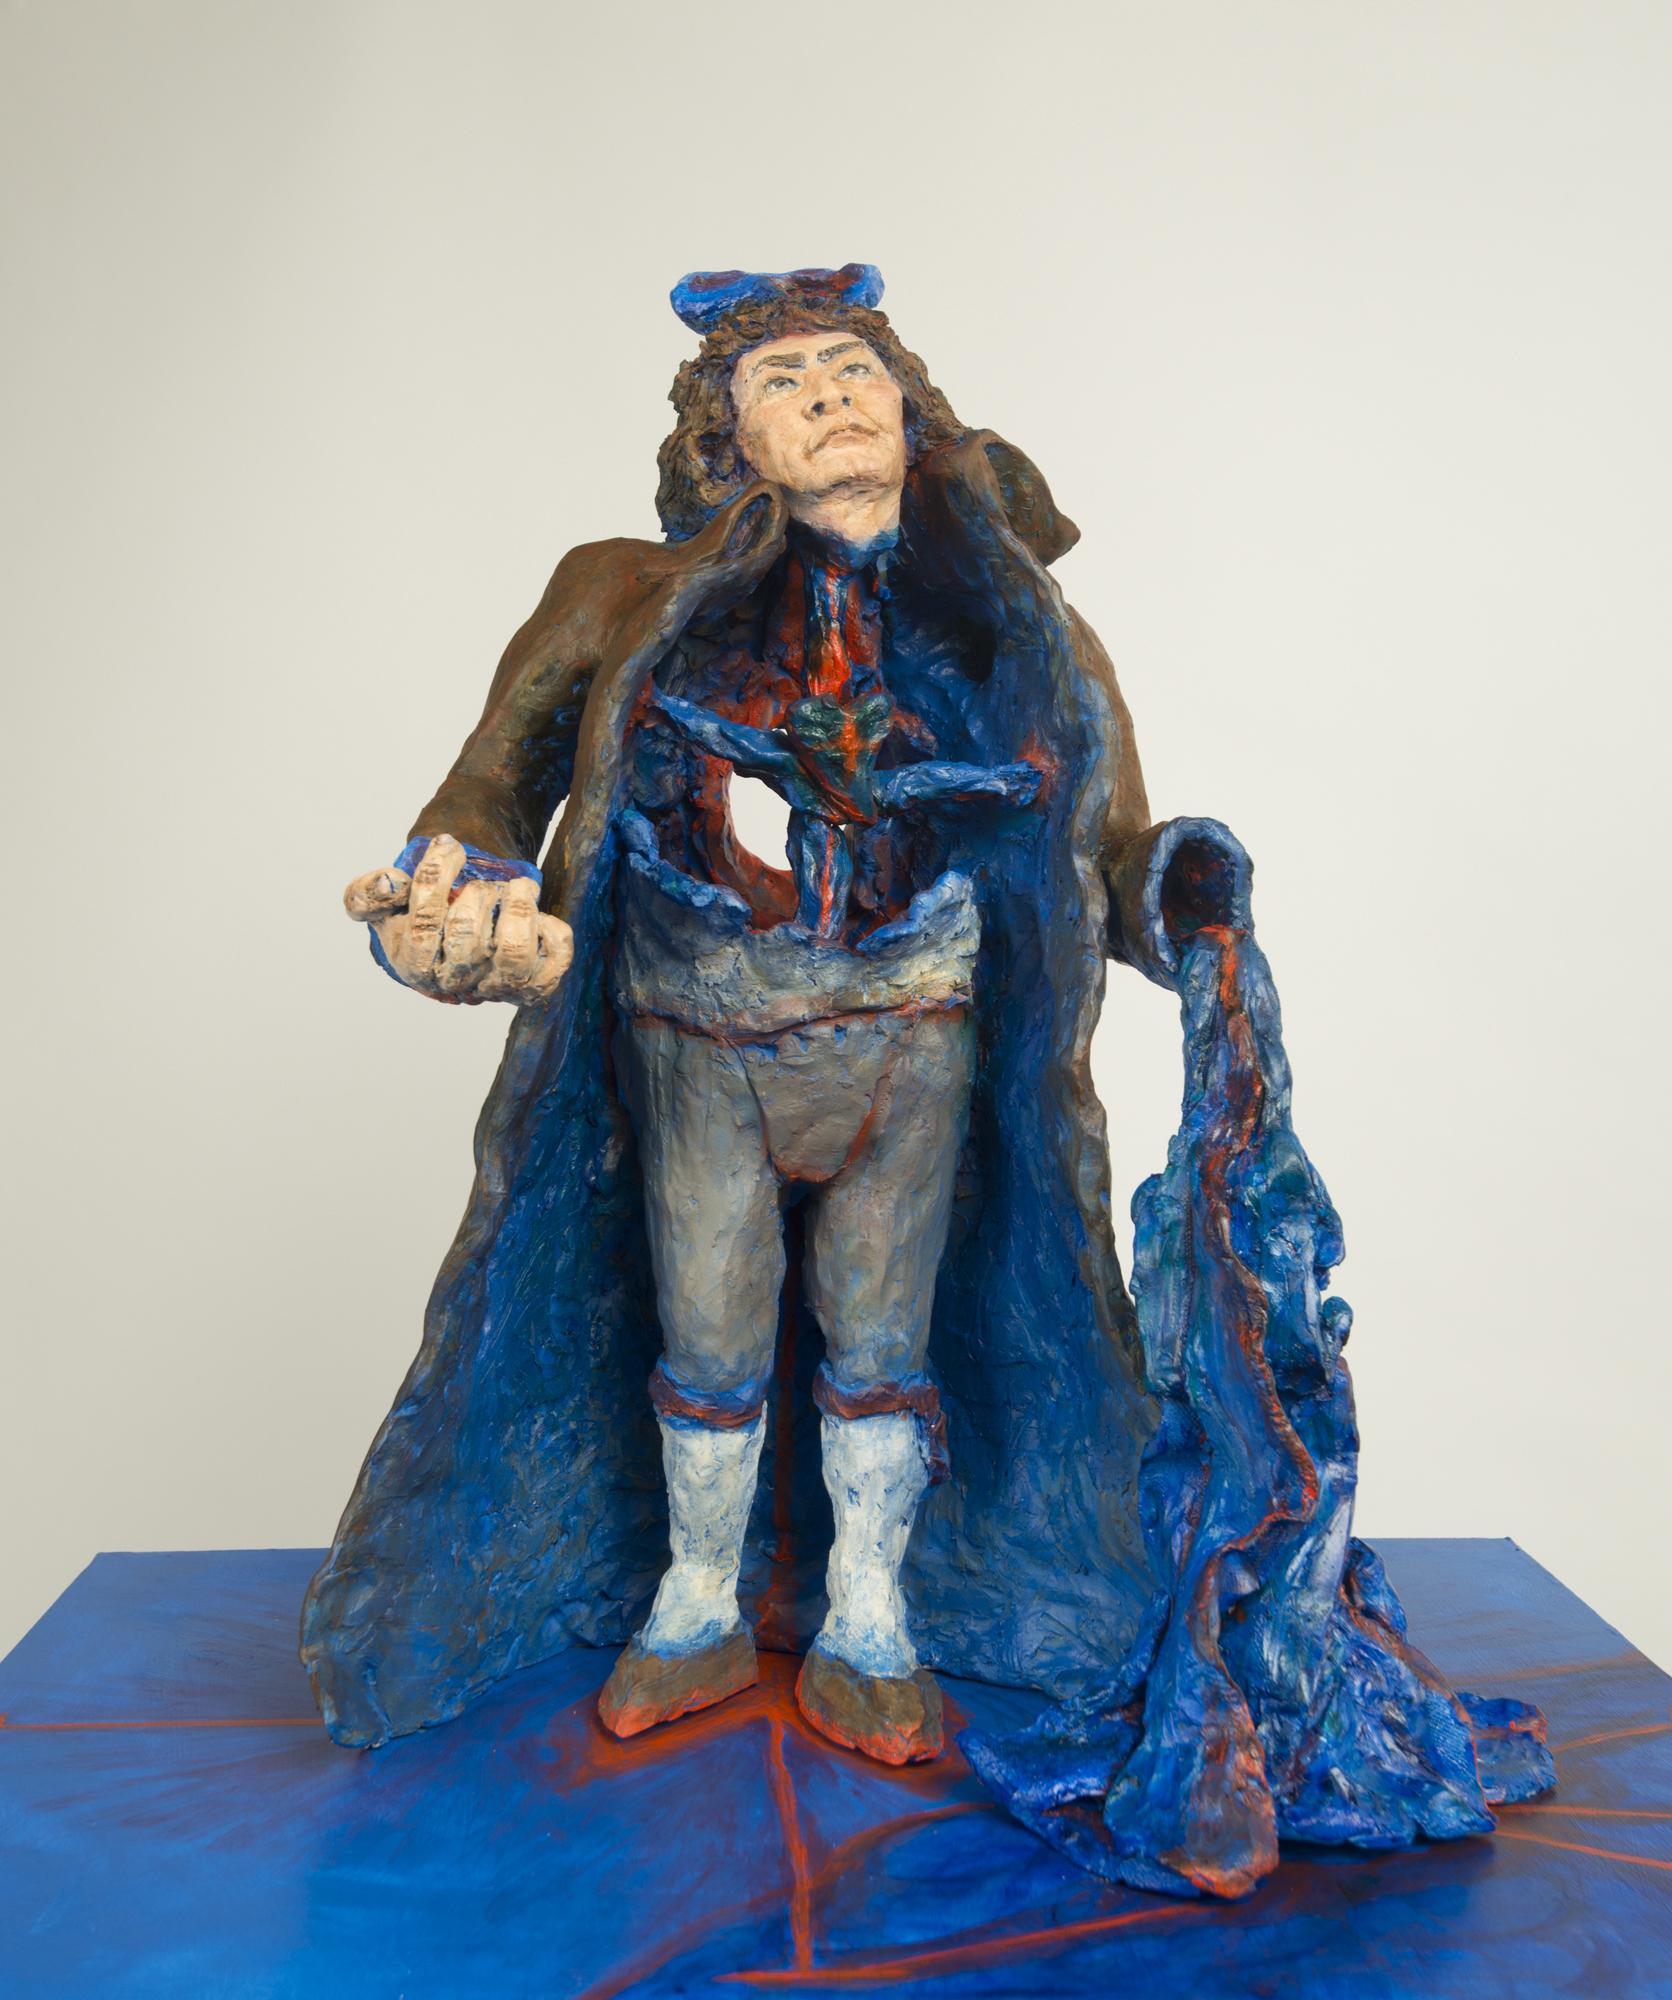 Beethoven_by_Sybil_Archibald_closeupF-sculpture-listening-to-gods-hearybeat.jpg